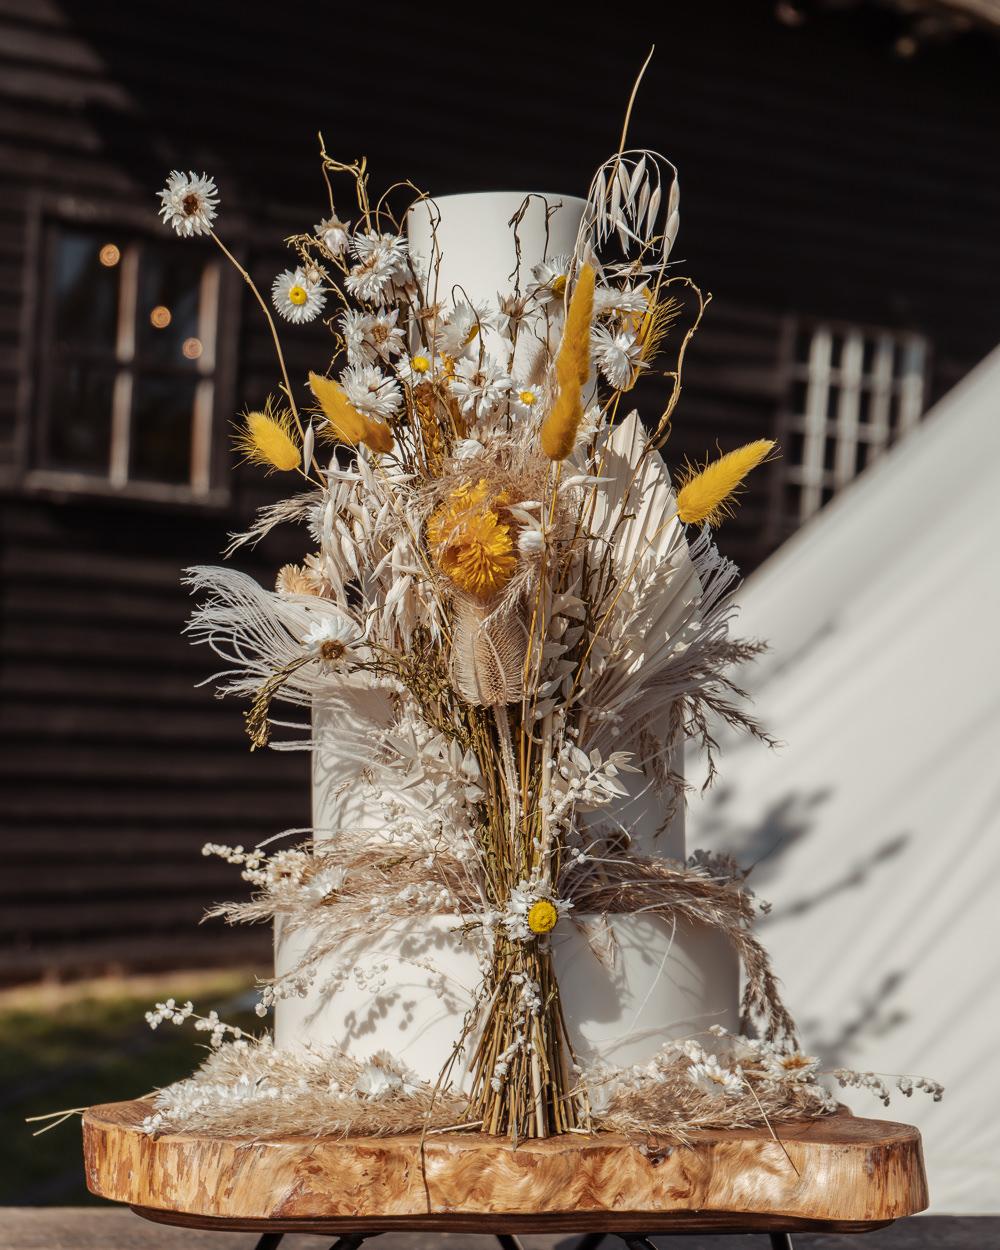 Cake Buttercream Dried Flowers Boho Bohemian Intimate Wedding Ideas Imogen Eve Photography